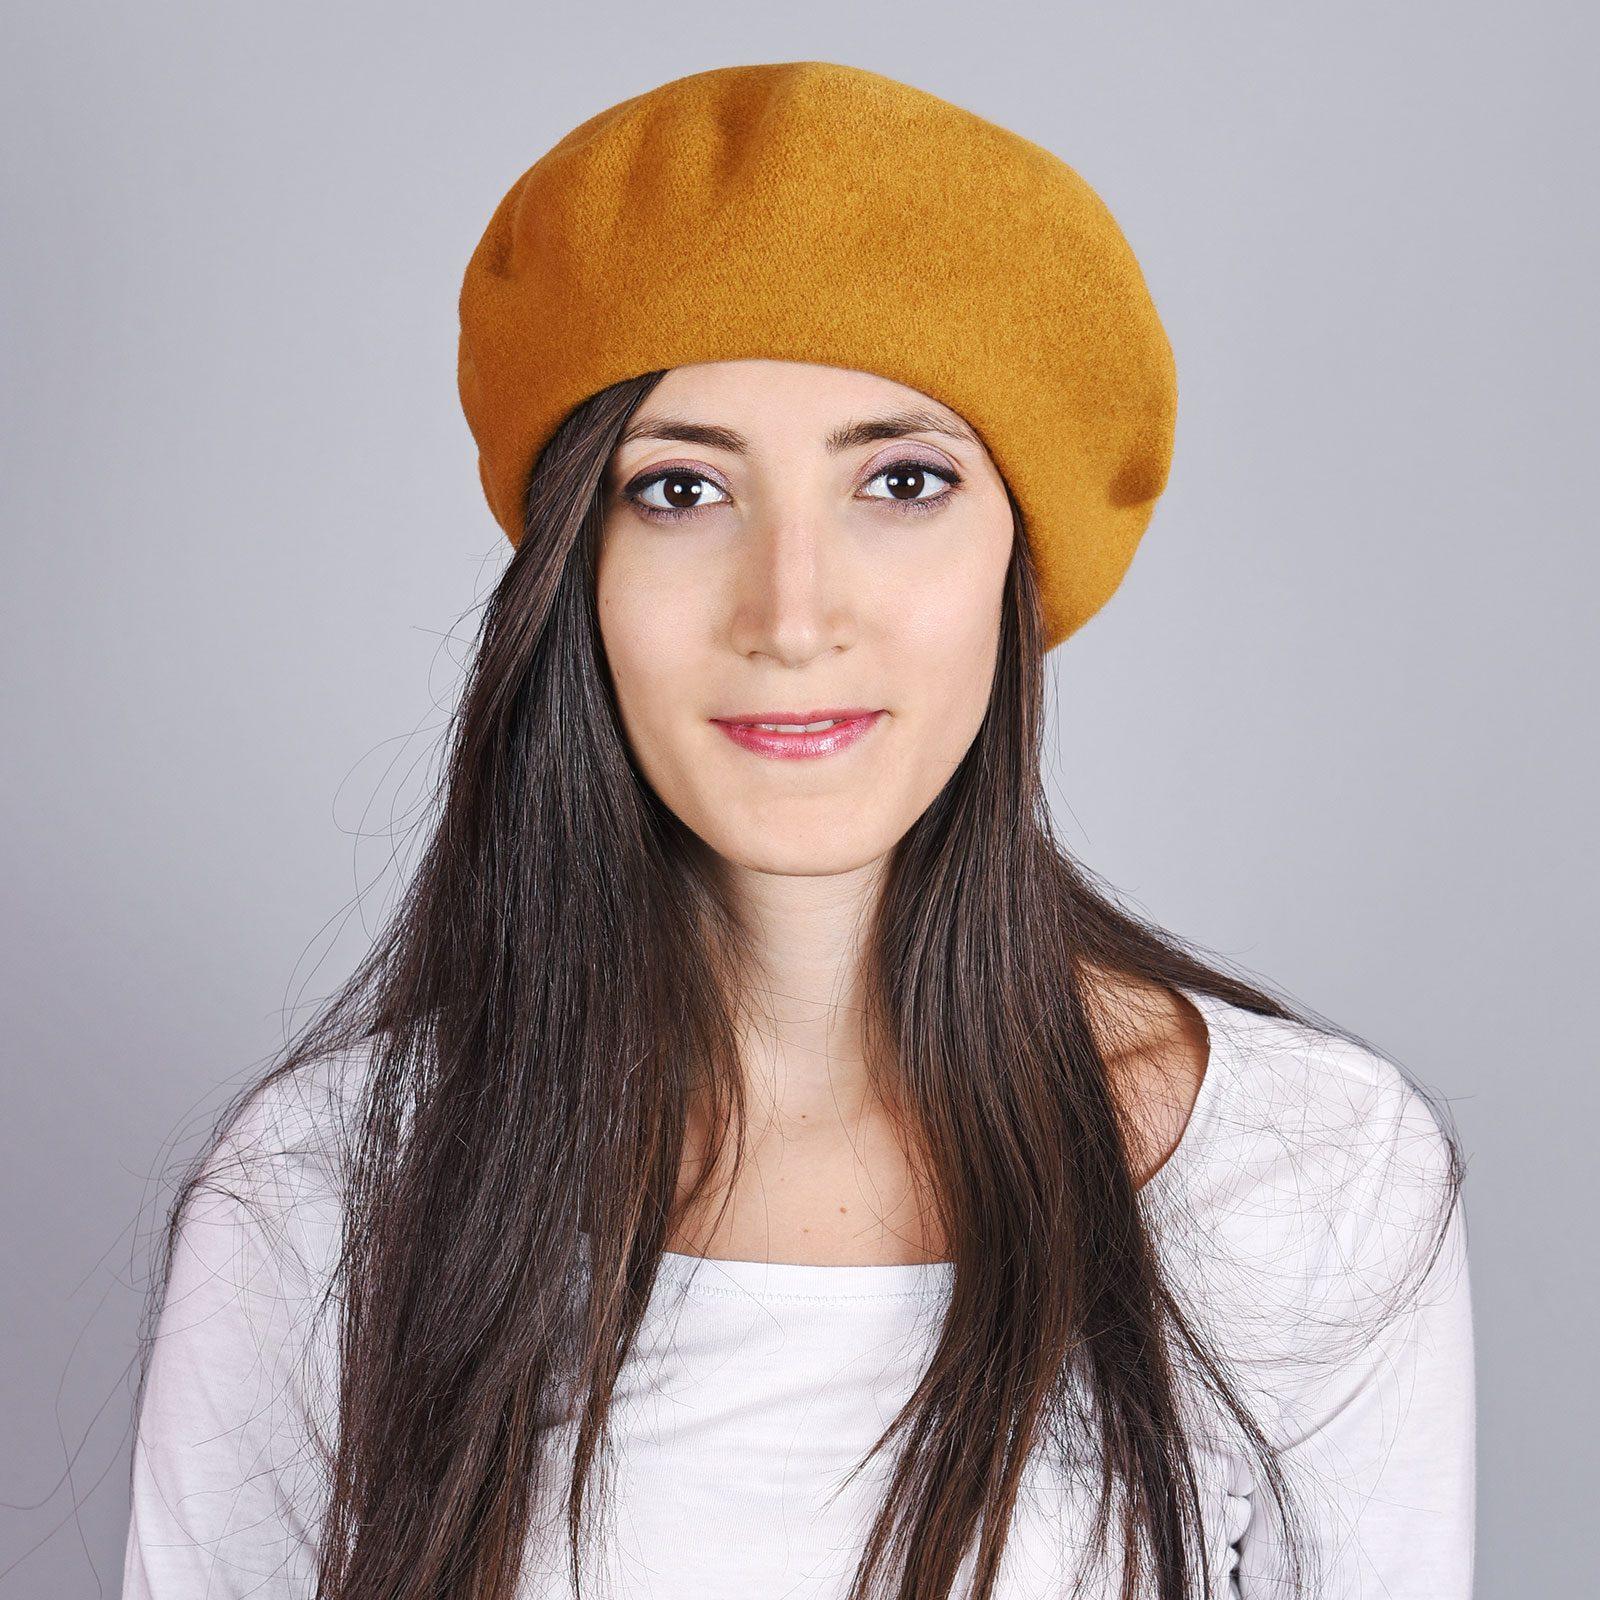 http://lookbook.allee-du-foulard.fr/wp-content/uploads/2018/11/CP-00989-VF16-1-beret-femme-moutarde-1600x1600.jpg